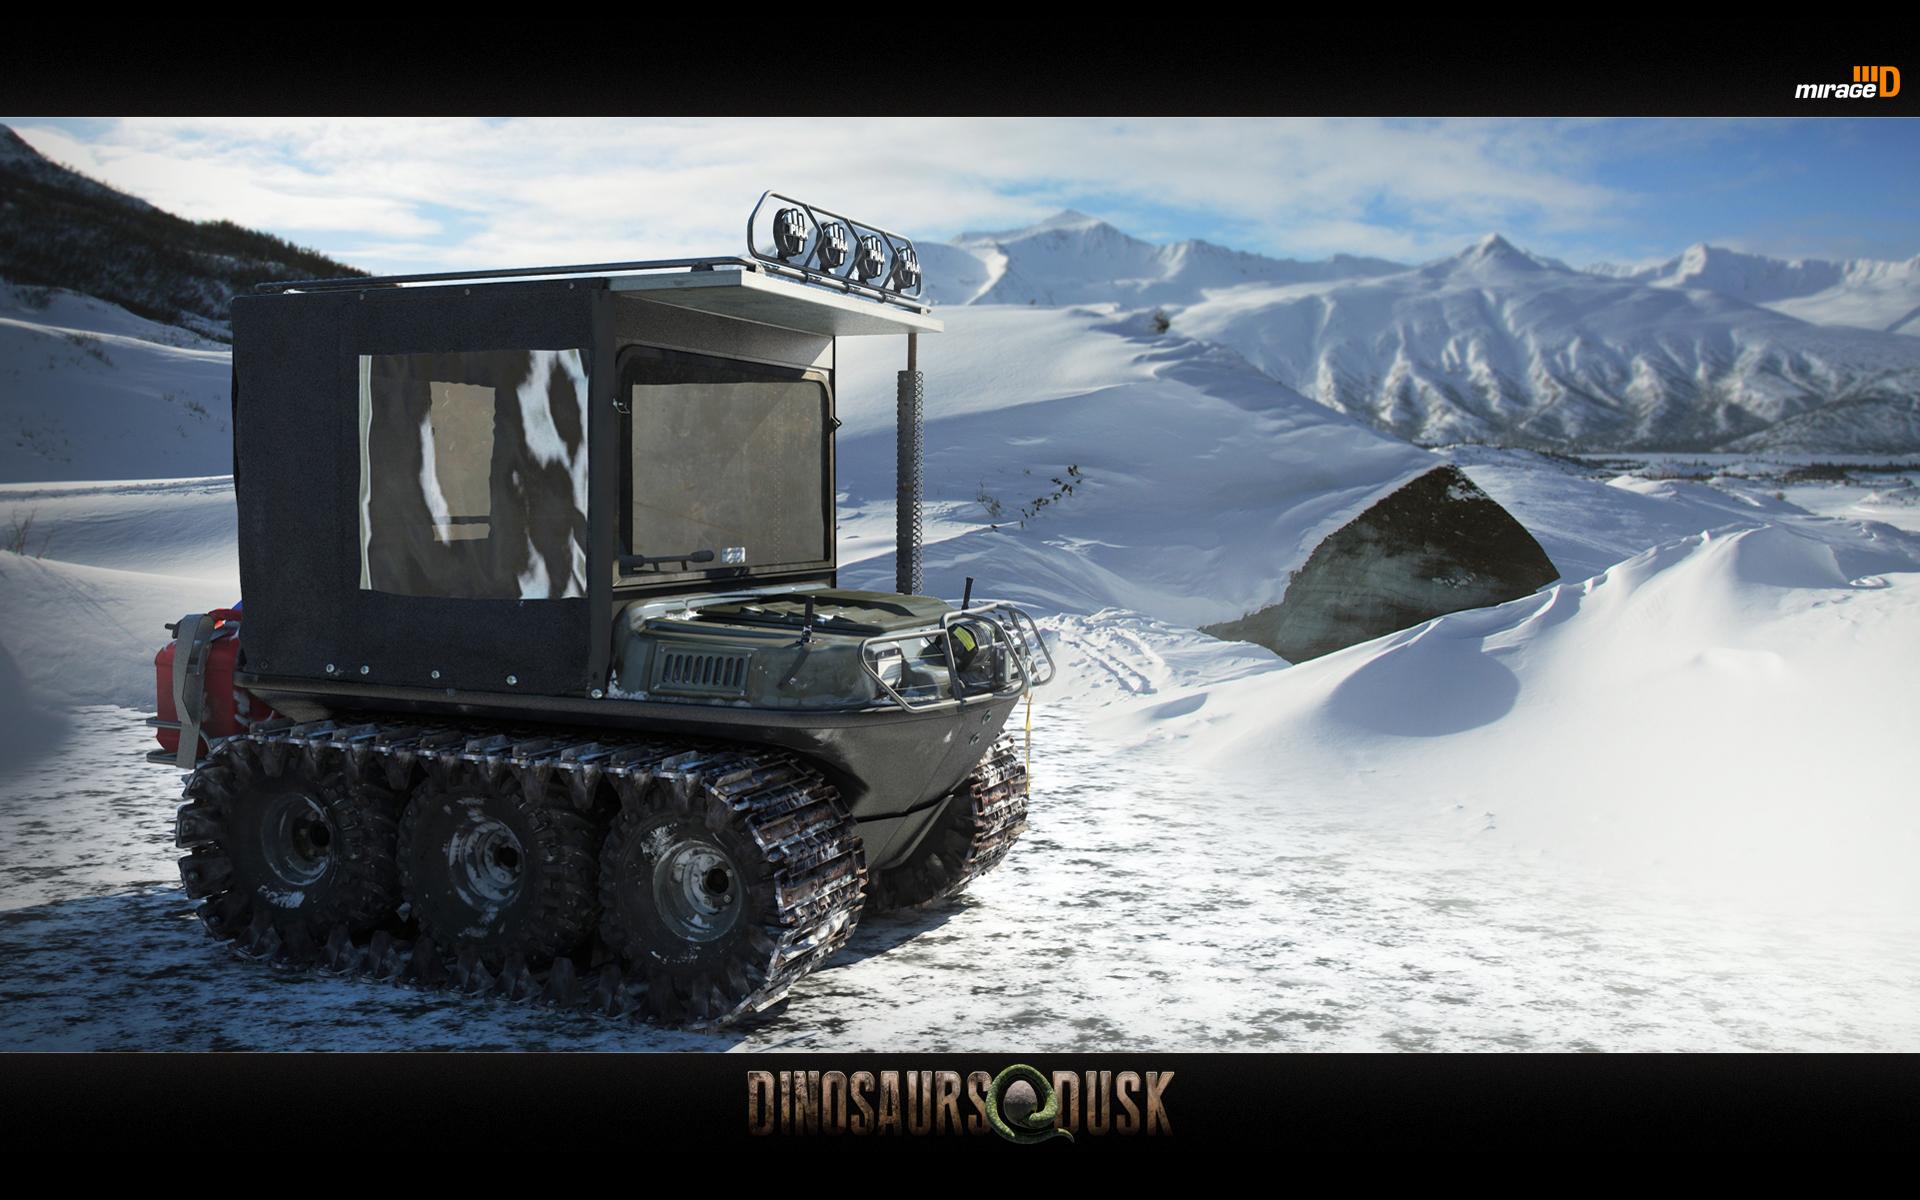 Dinosaurs@Dusk - Official Website Dinosaurs